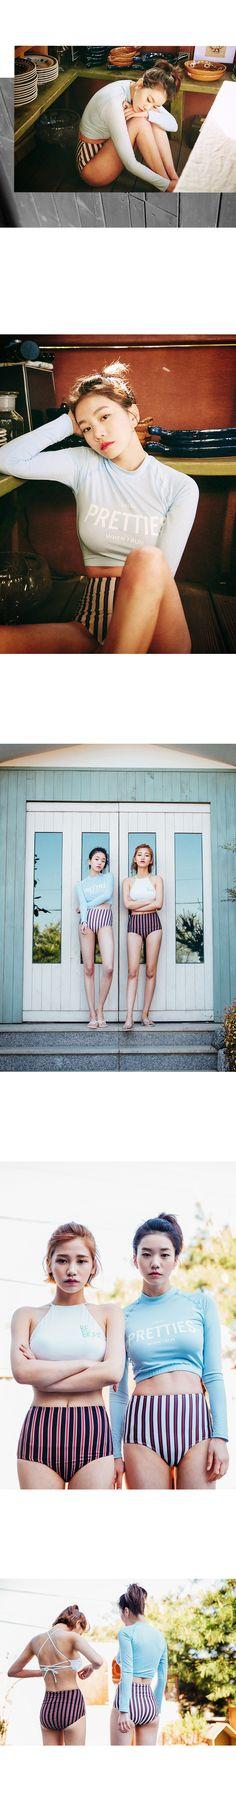 MOSSBEAN | pretties 레트로 rash guard set | summer look